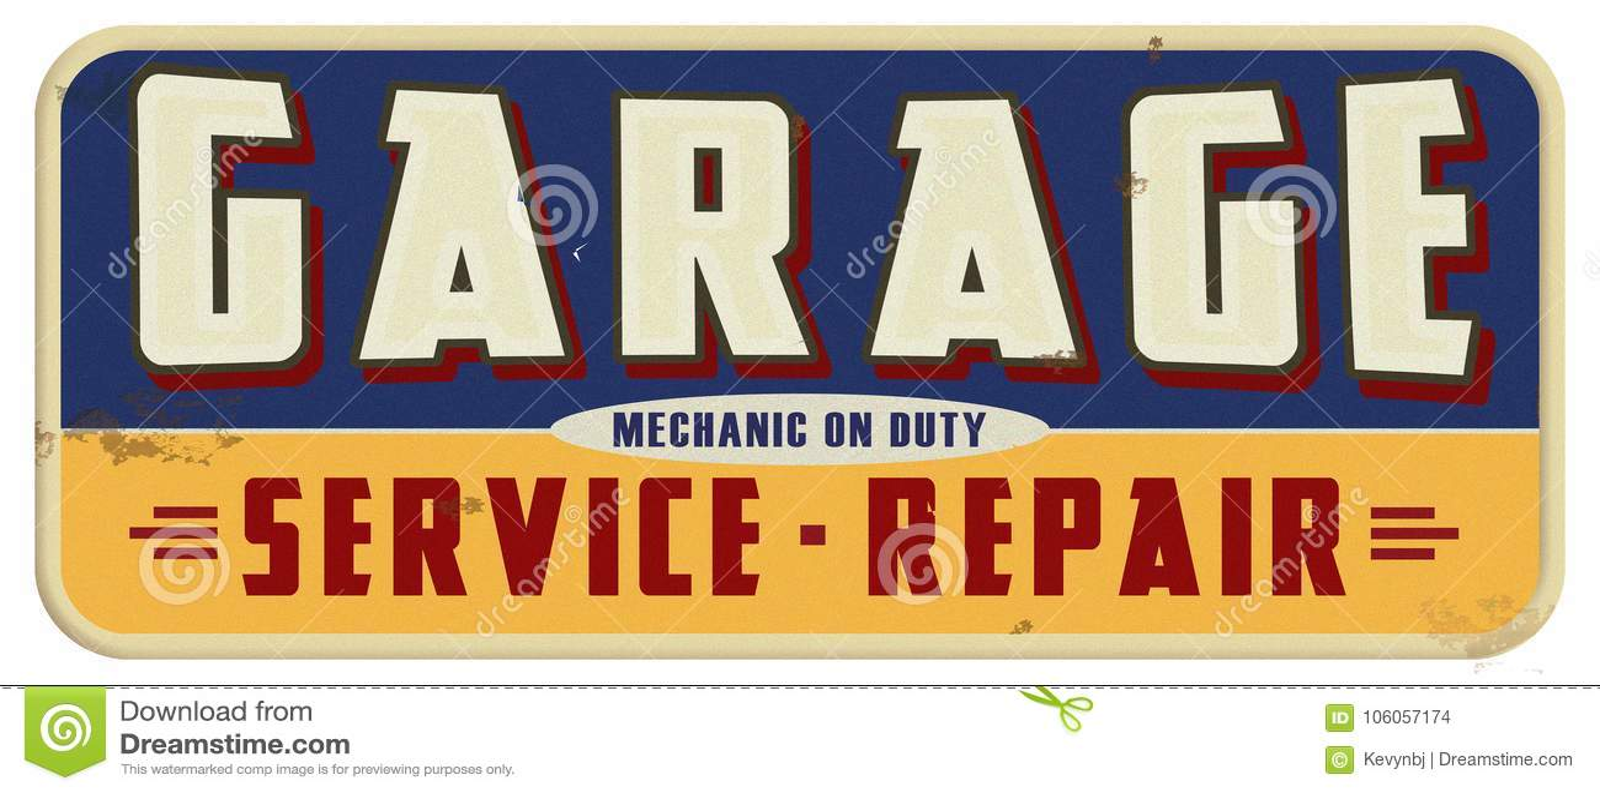 Garage Mechanic On Duty Sign